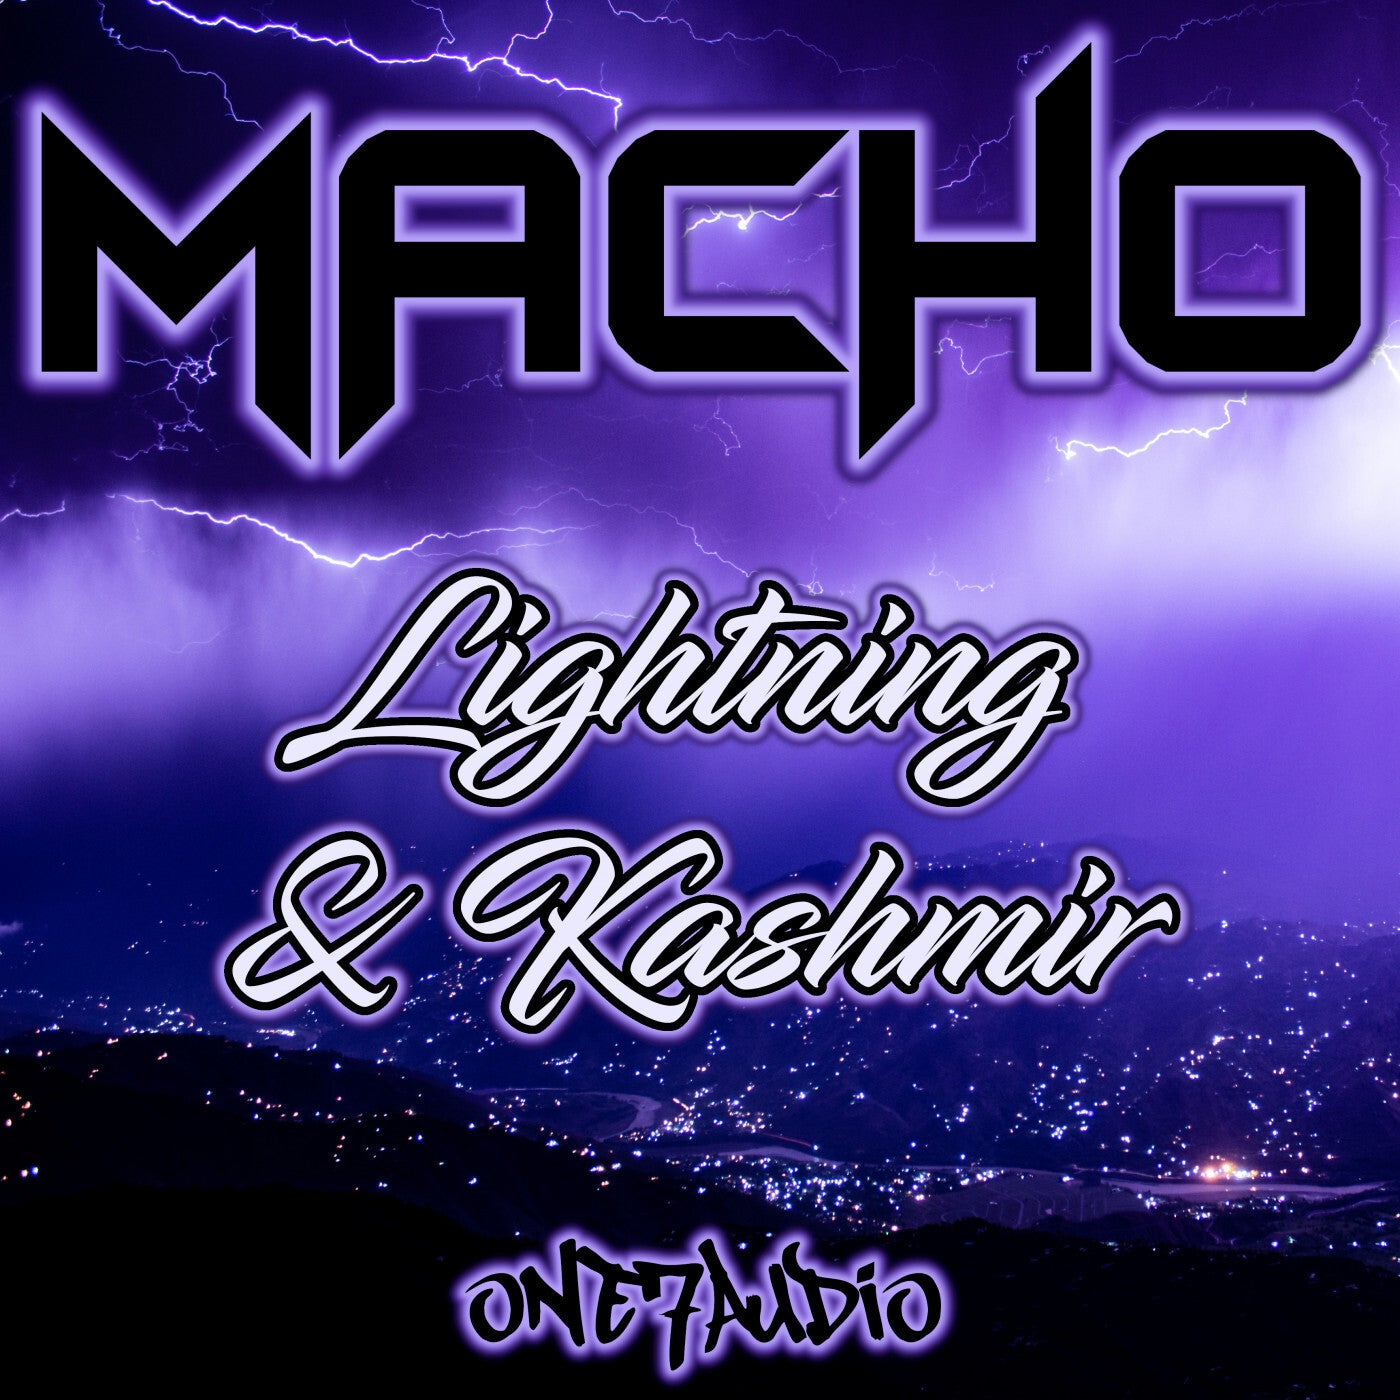 Kashmir (Original Mix)